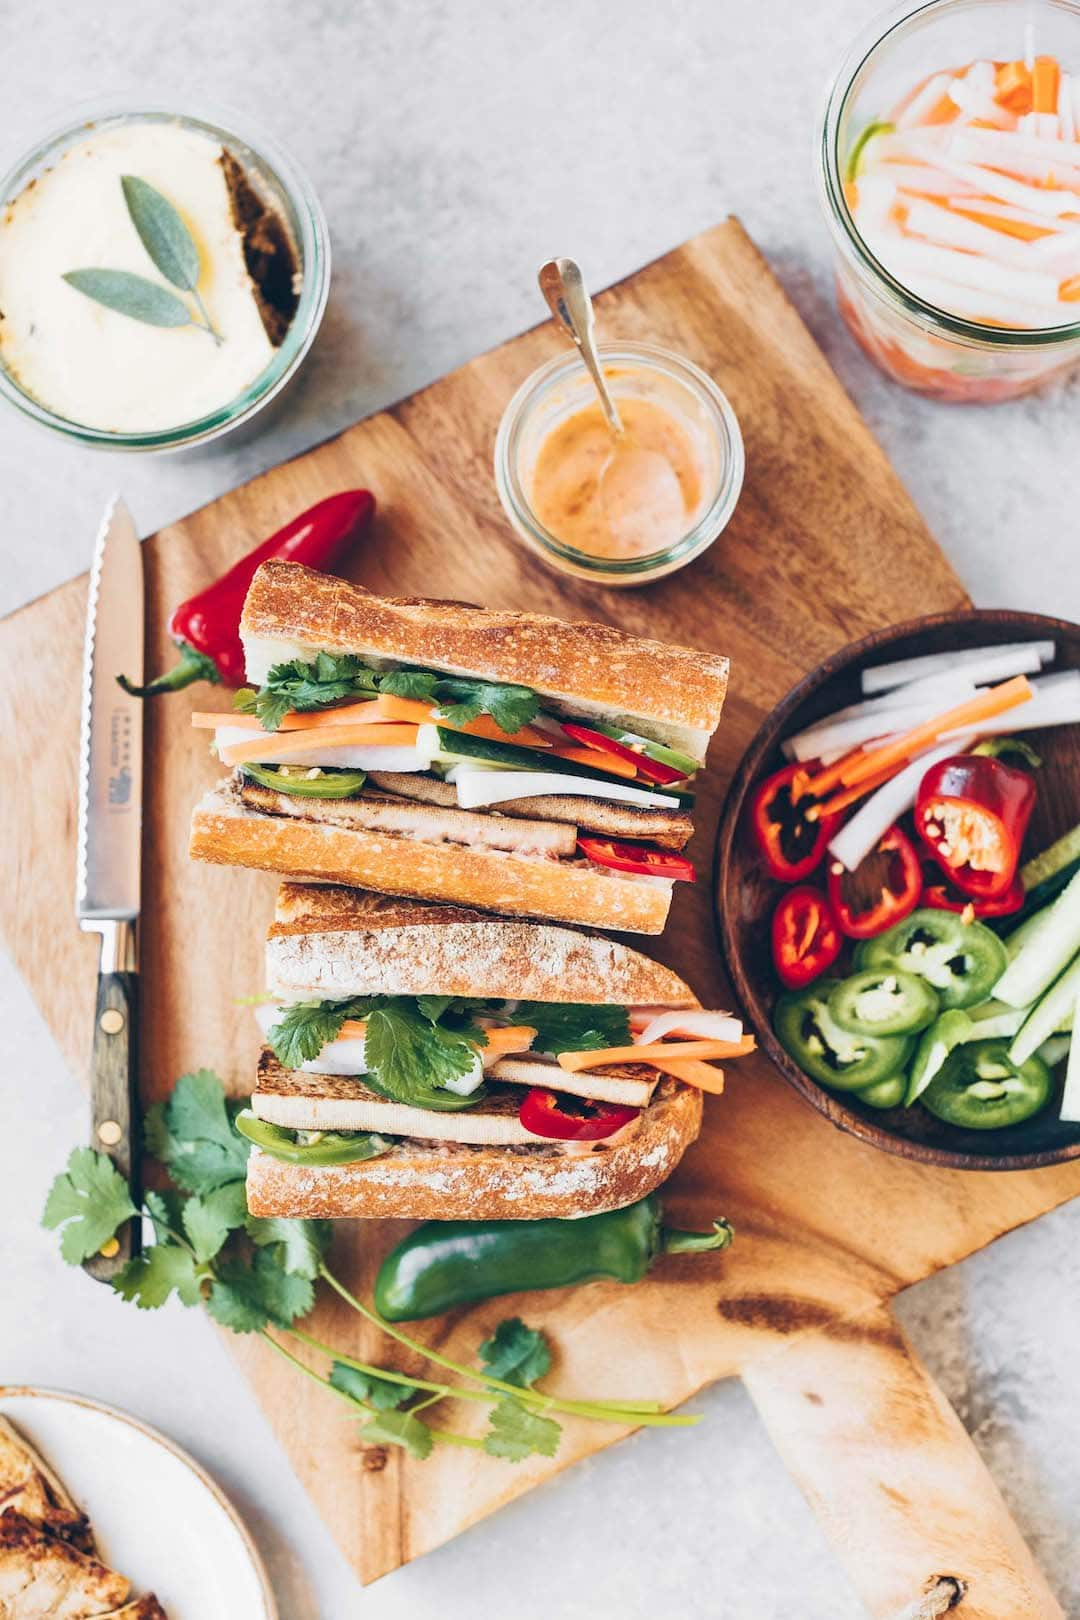 11 Yummy Plant Based Sandwiches - Vegan Banh Mi Sandwich